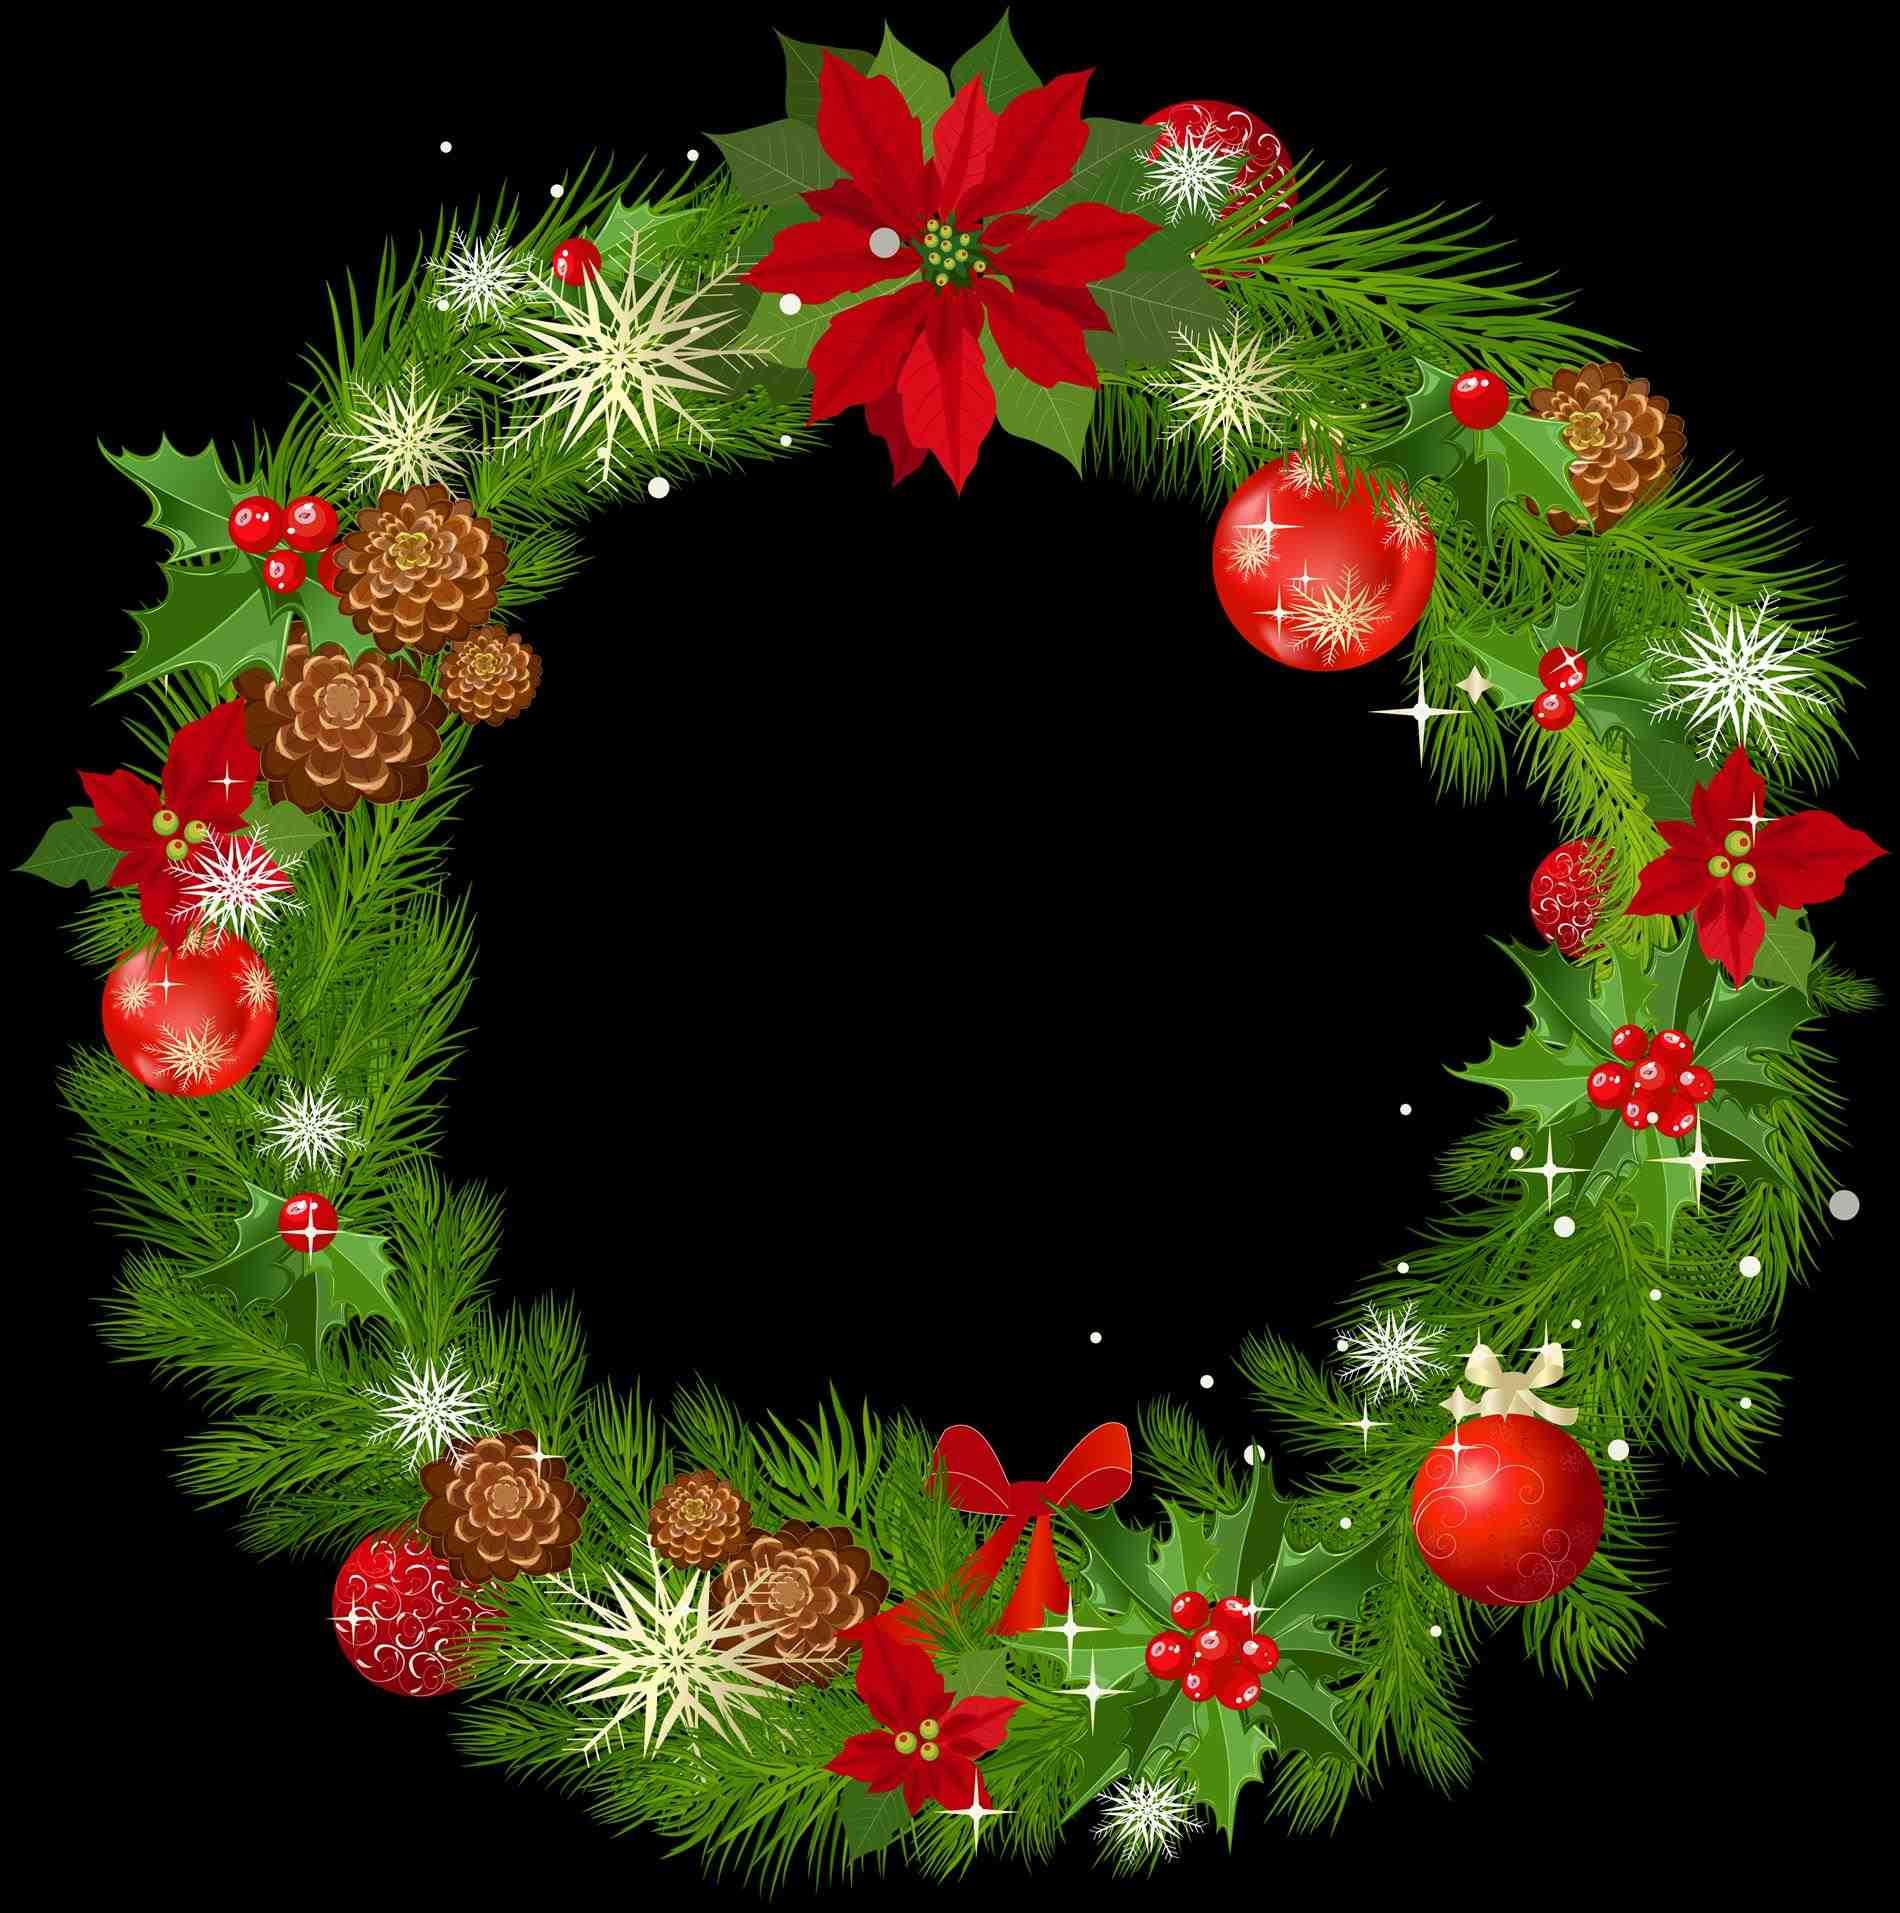 Free PNG HD Christmas Wreath - 126833